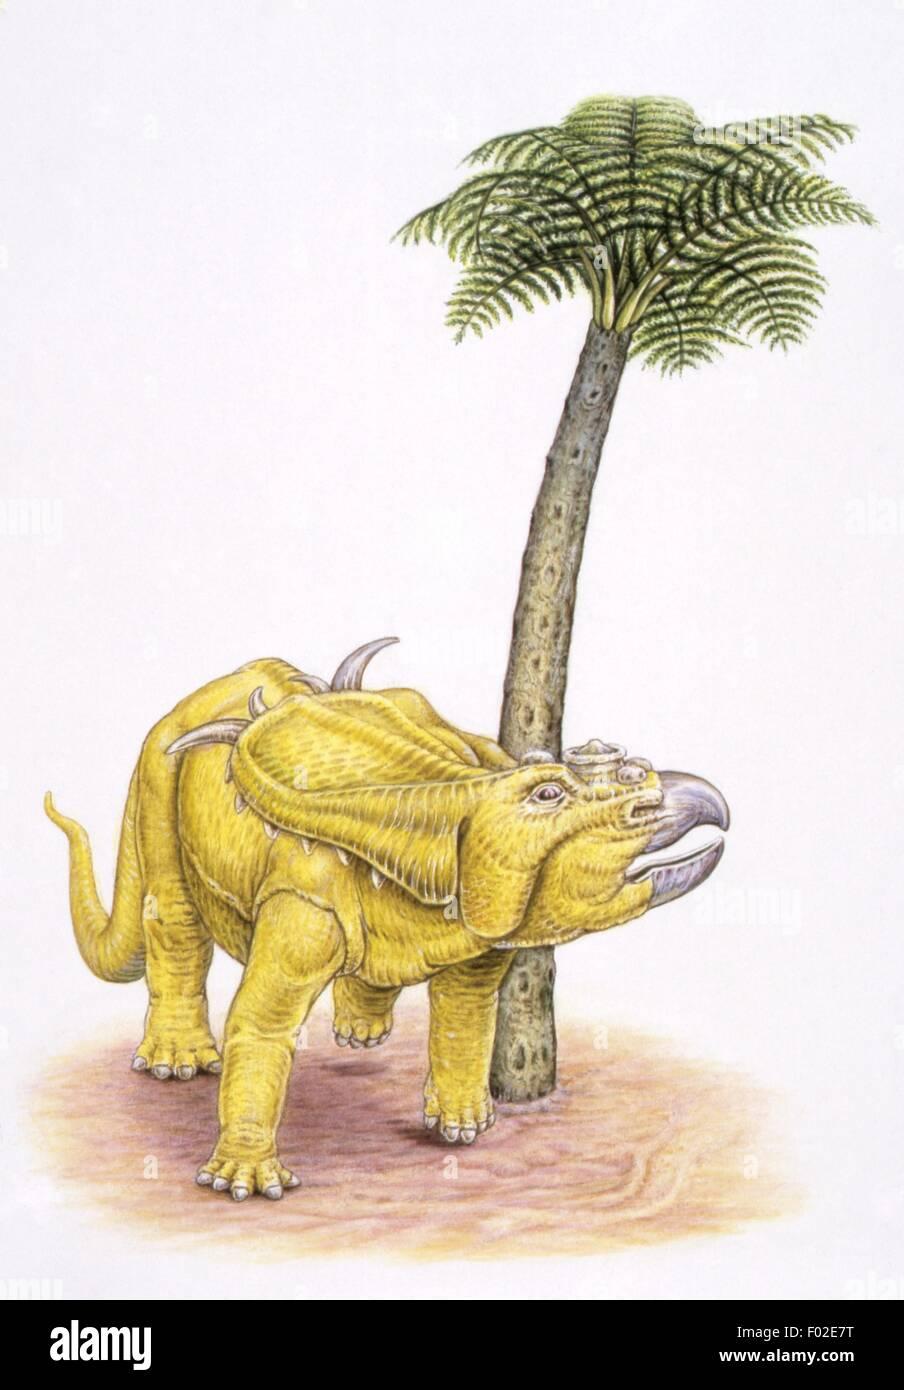 Zoopaleontologia - del periodo Cretaceo - i dinosauri - Pachyrhinosaurus - opera d'arte Foto Stock